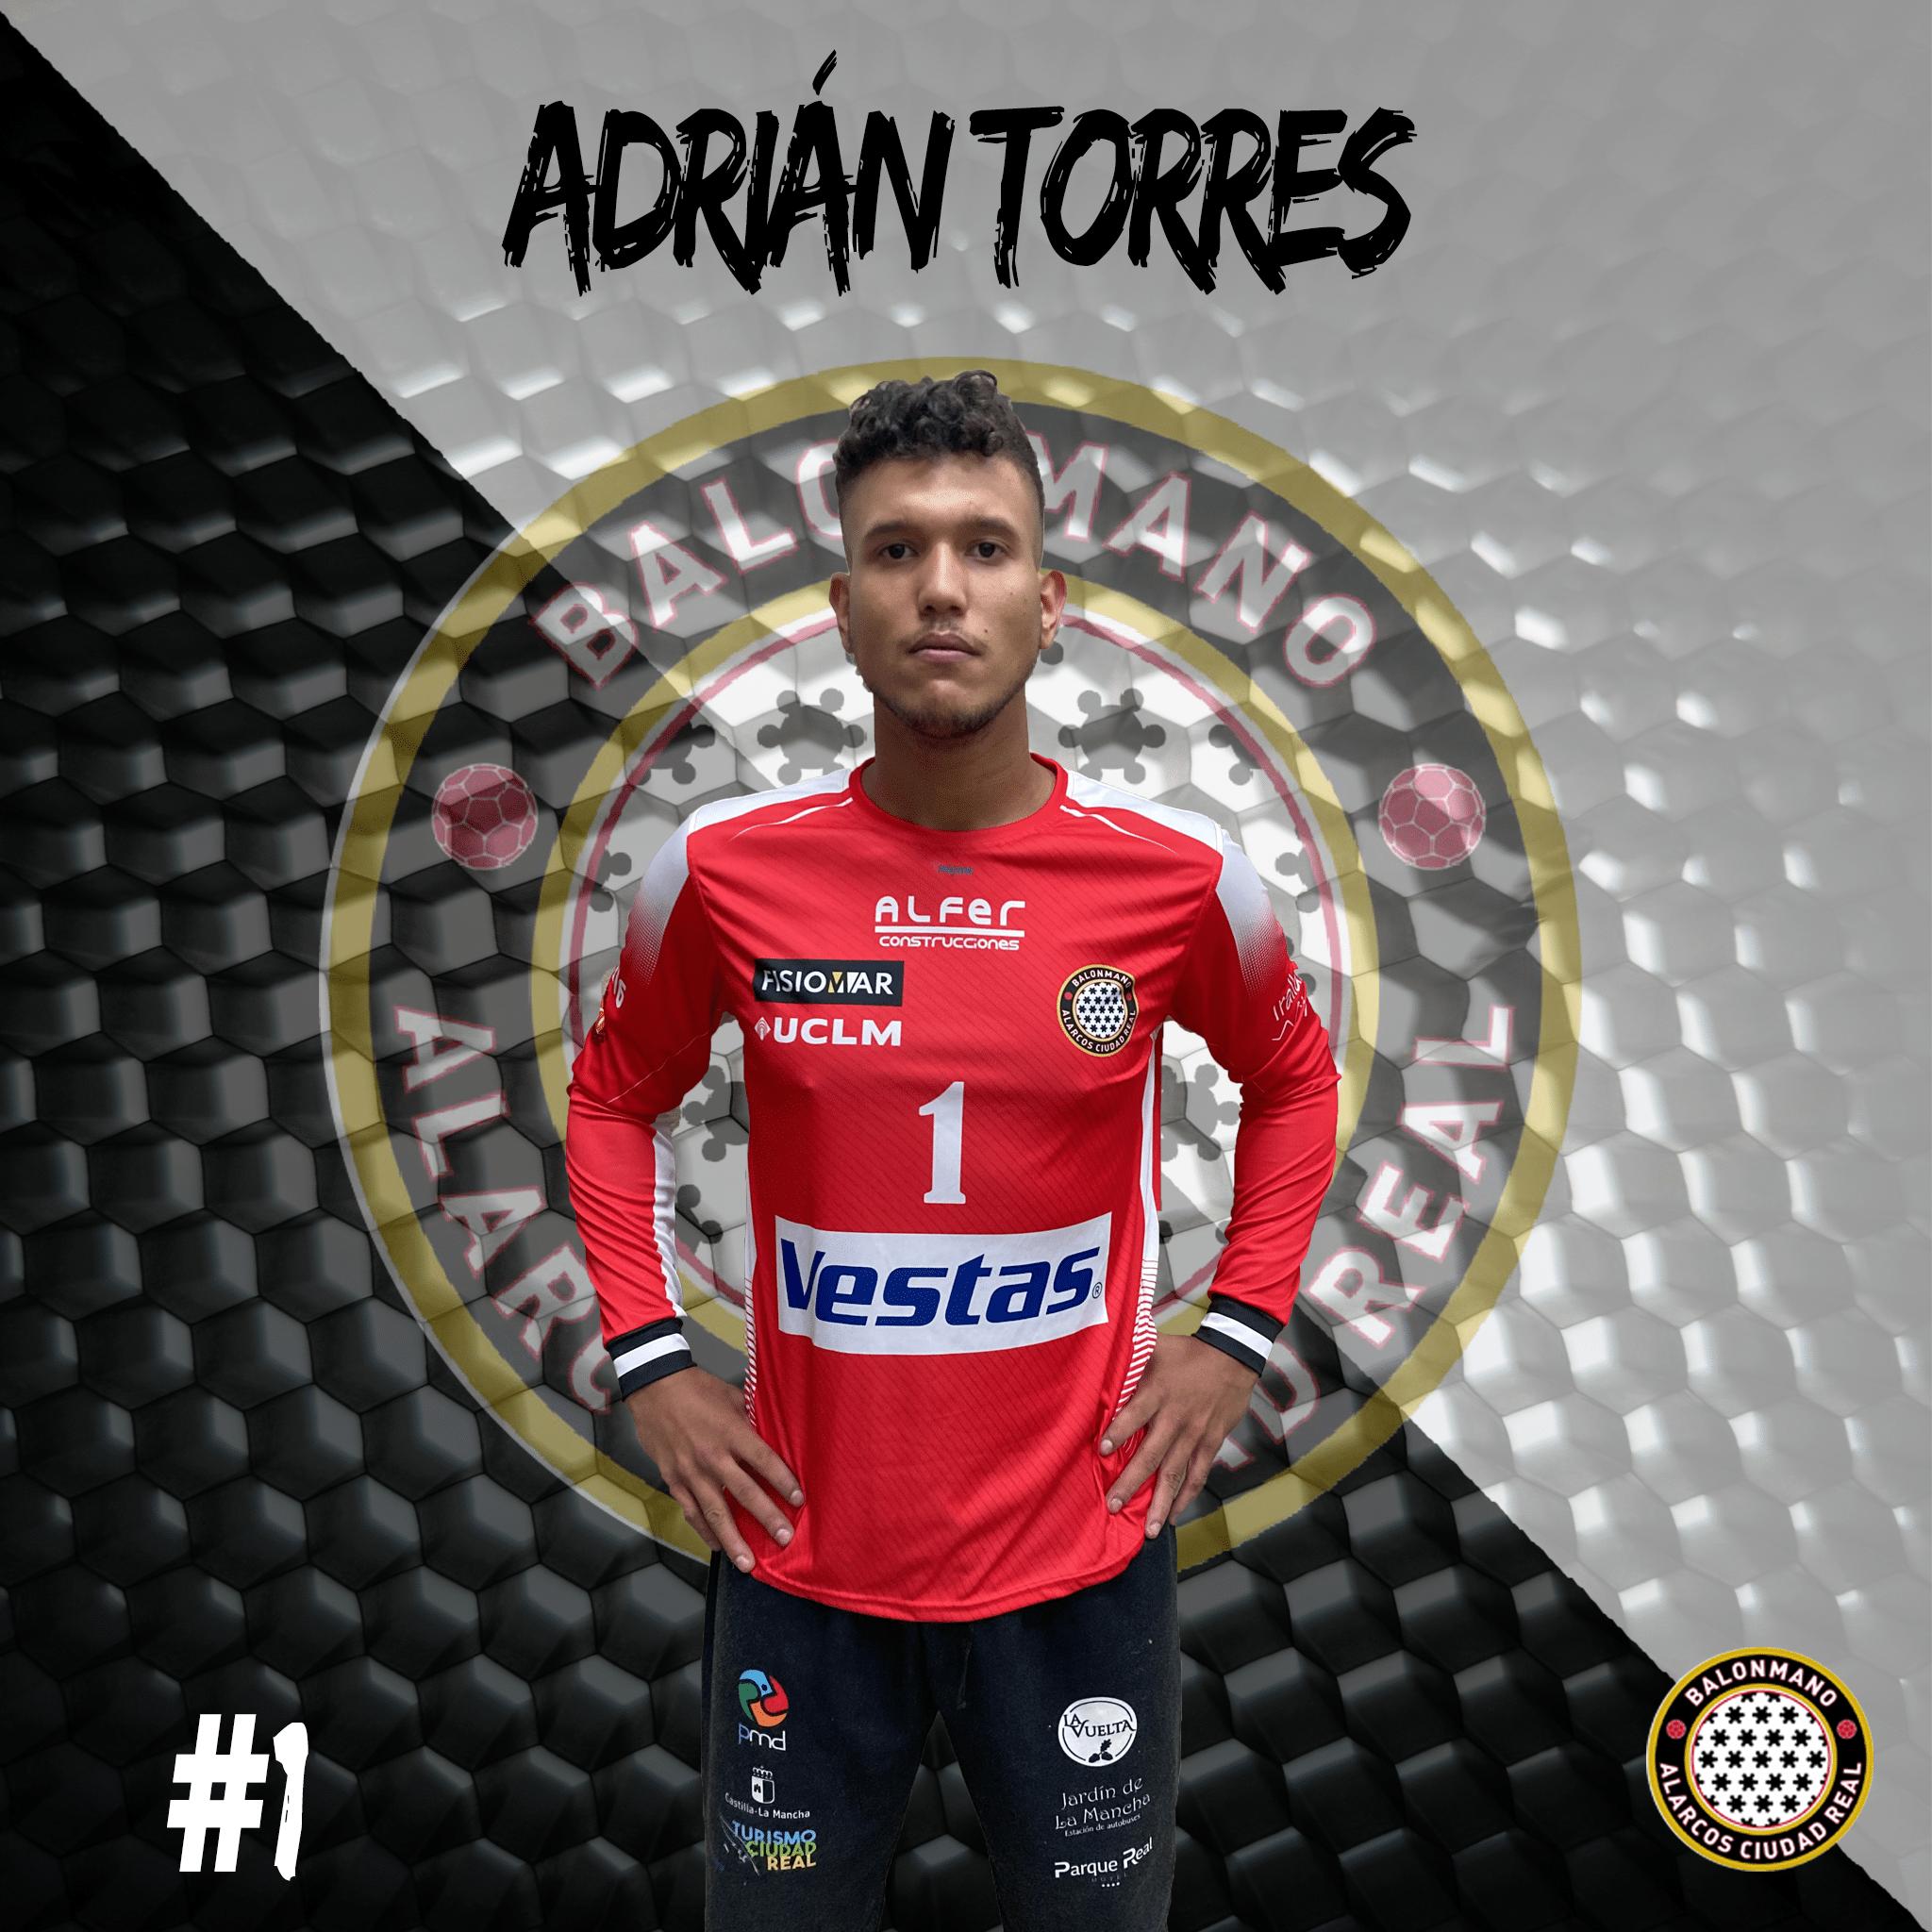 1. ADRIÁN TORRES